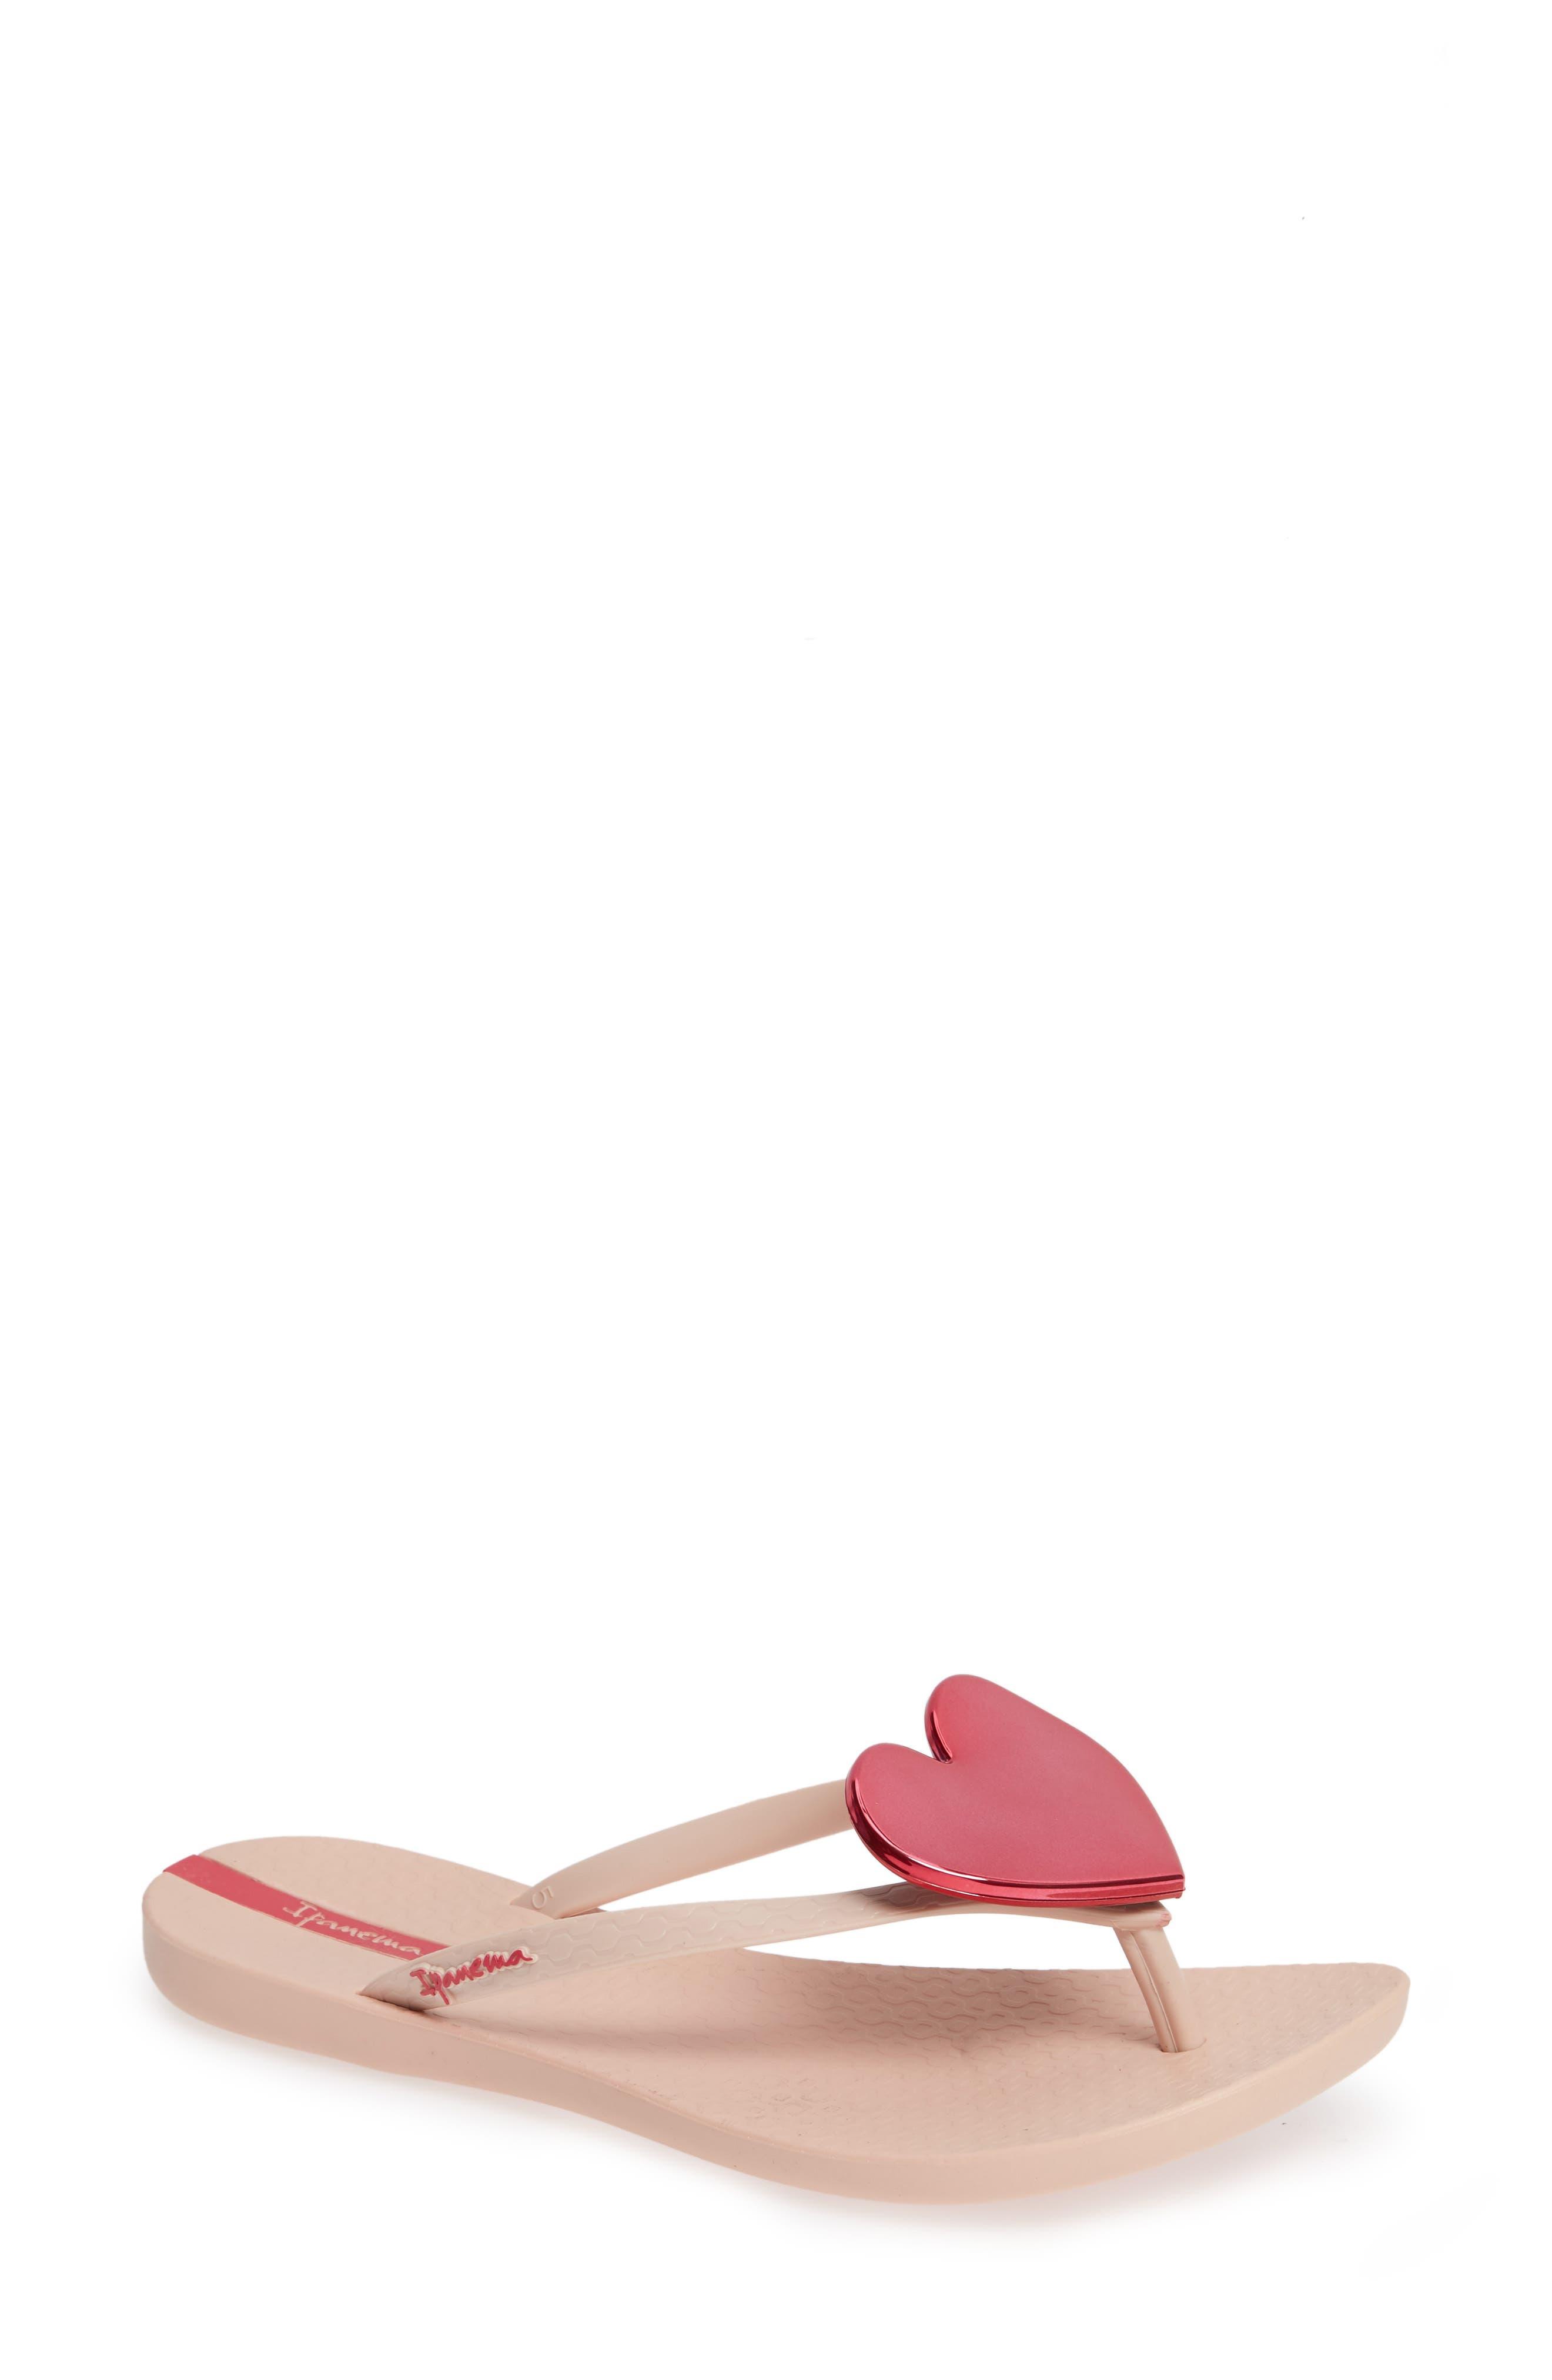 Wave Heart Flip Flop,                             Main thumbnail 1, color,                             Pink/ Pink